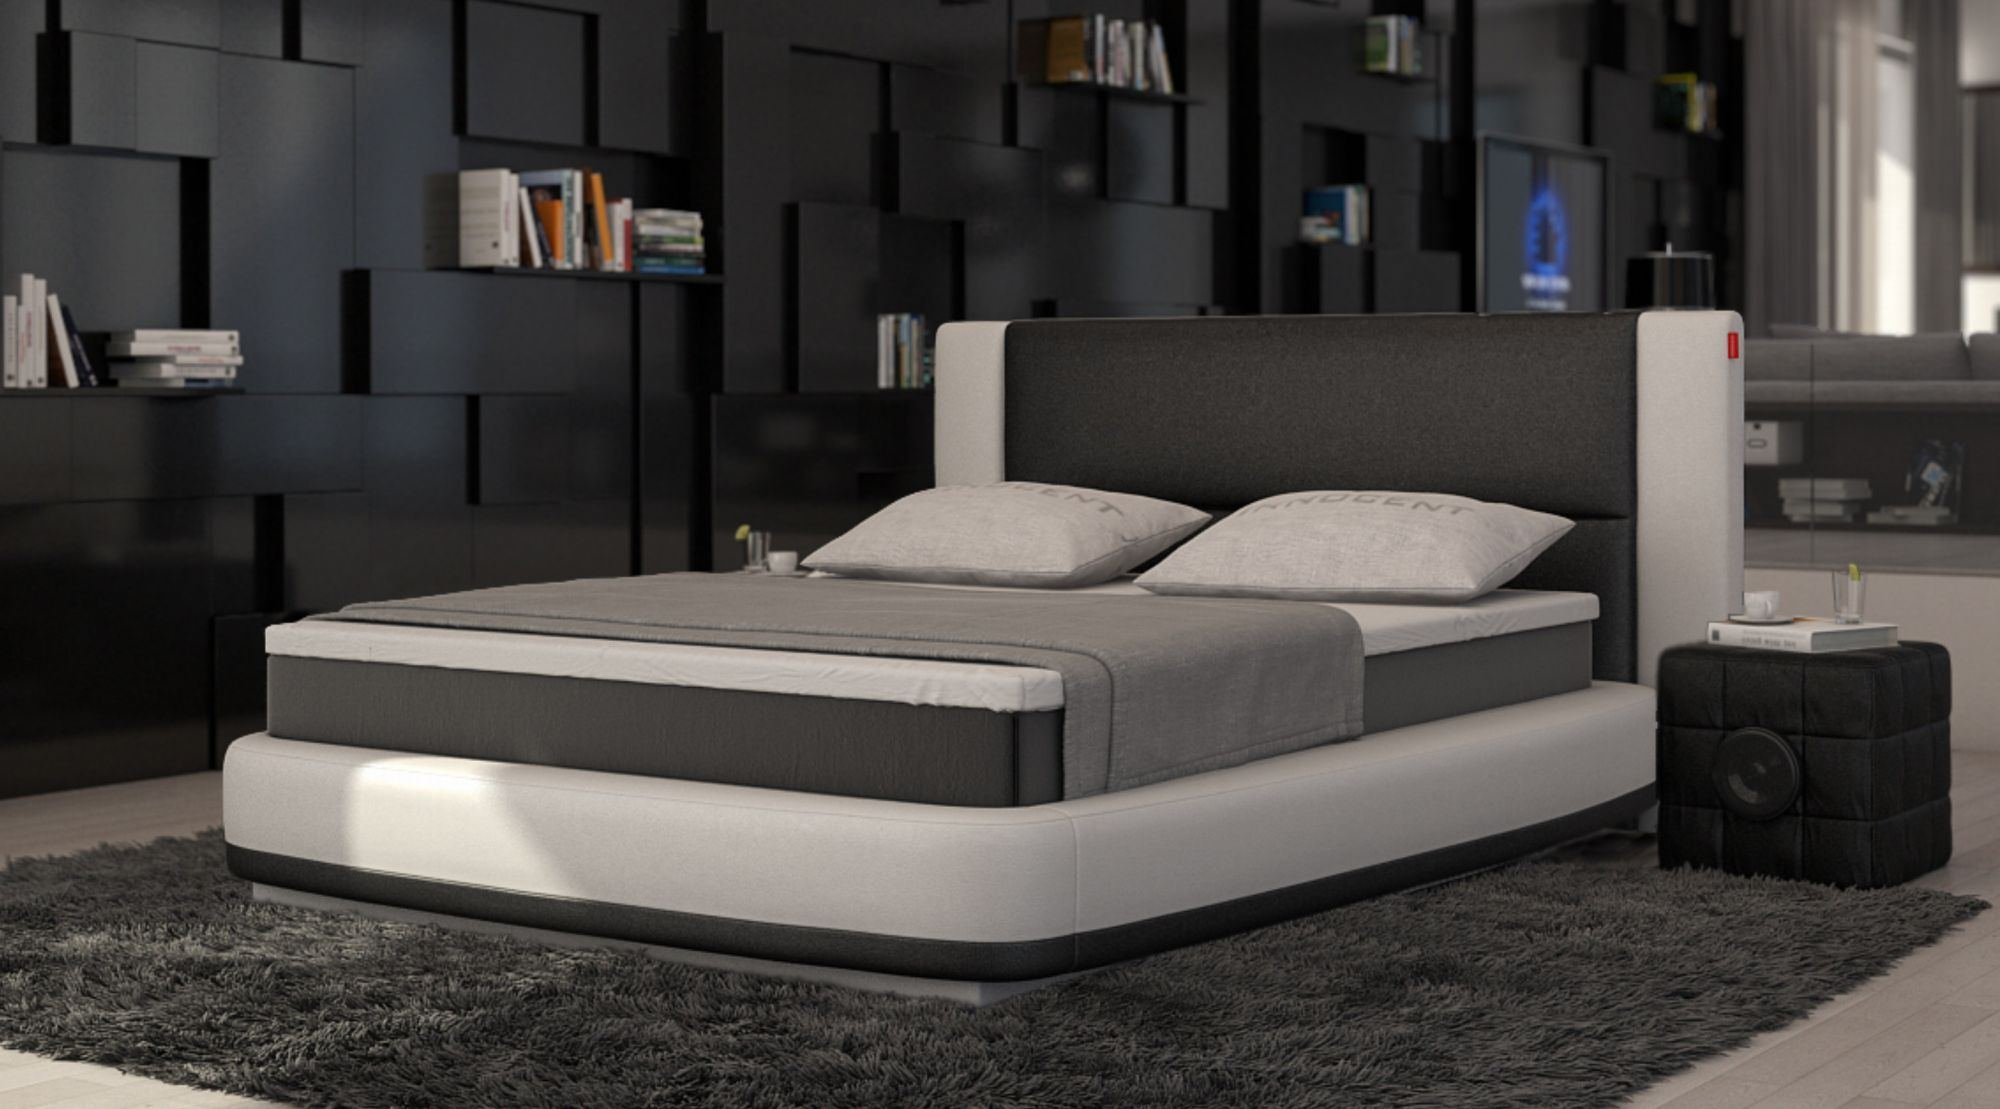 sofas ledersofa boxspringbett aquila wei schwarz sofort lieferbar g nstig online kaufen. Black Bedroom Furniture Sets. Home Design Ideas